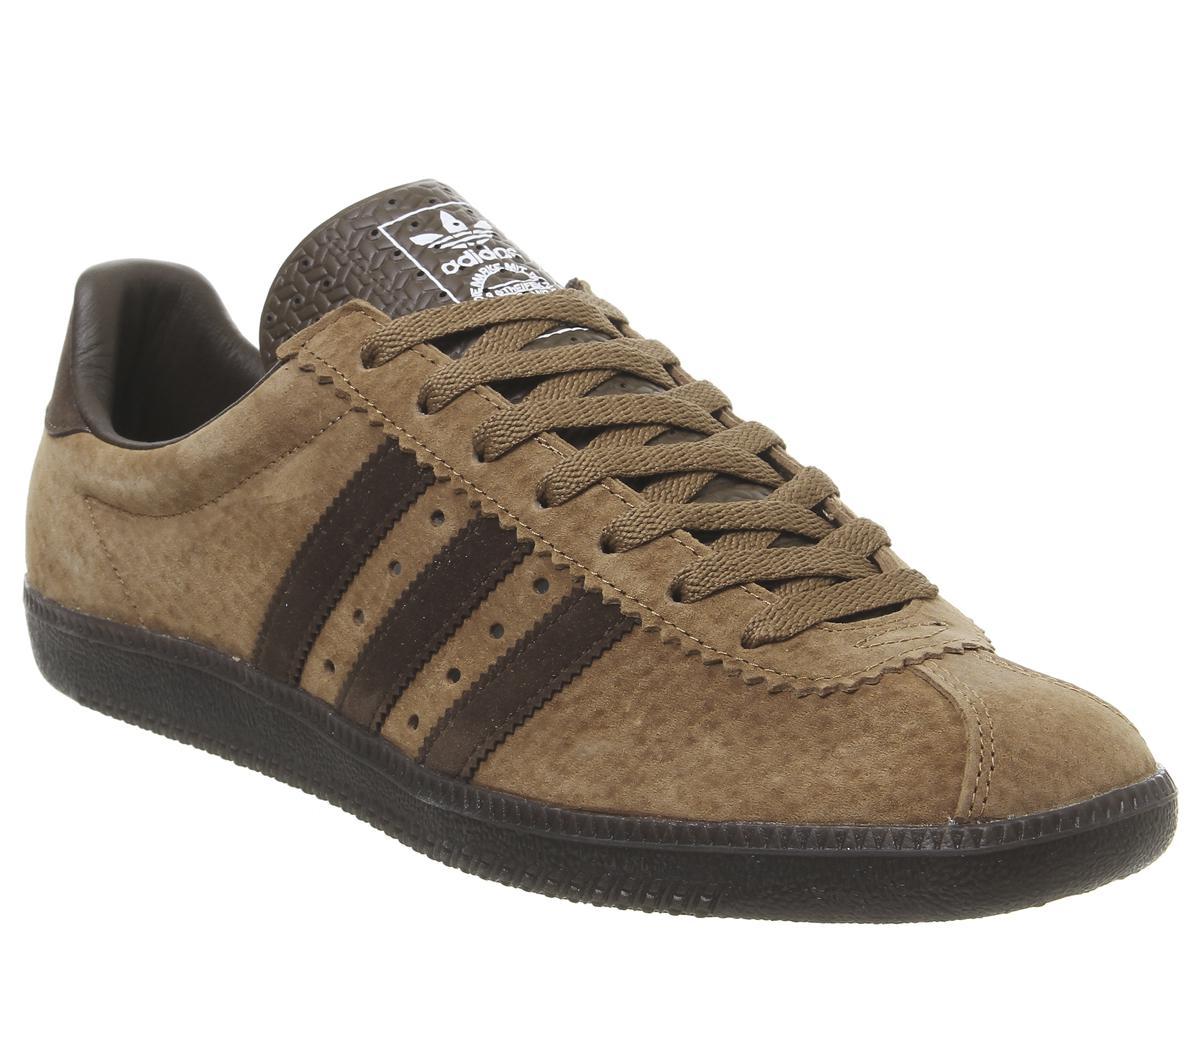 Adidas Padiham Spezial Trainers for Men - Lyst 137ed1d36